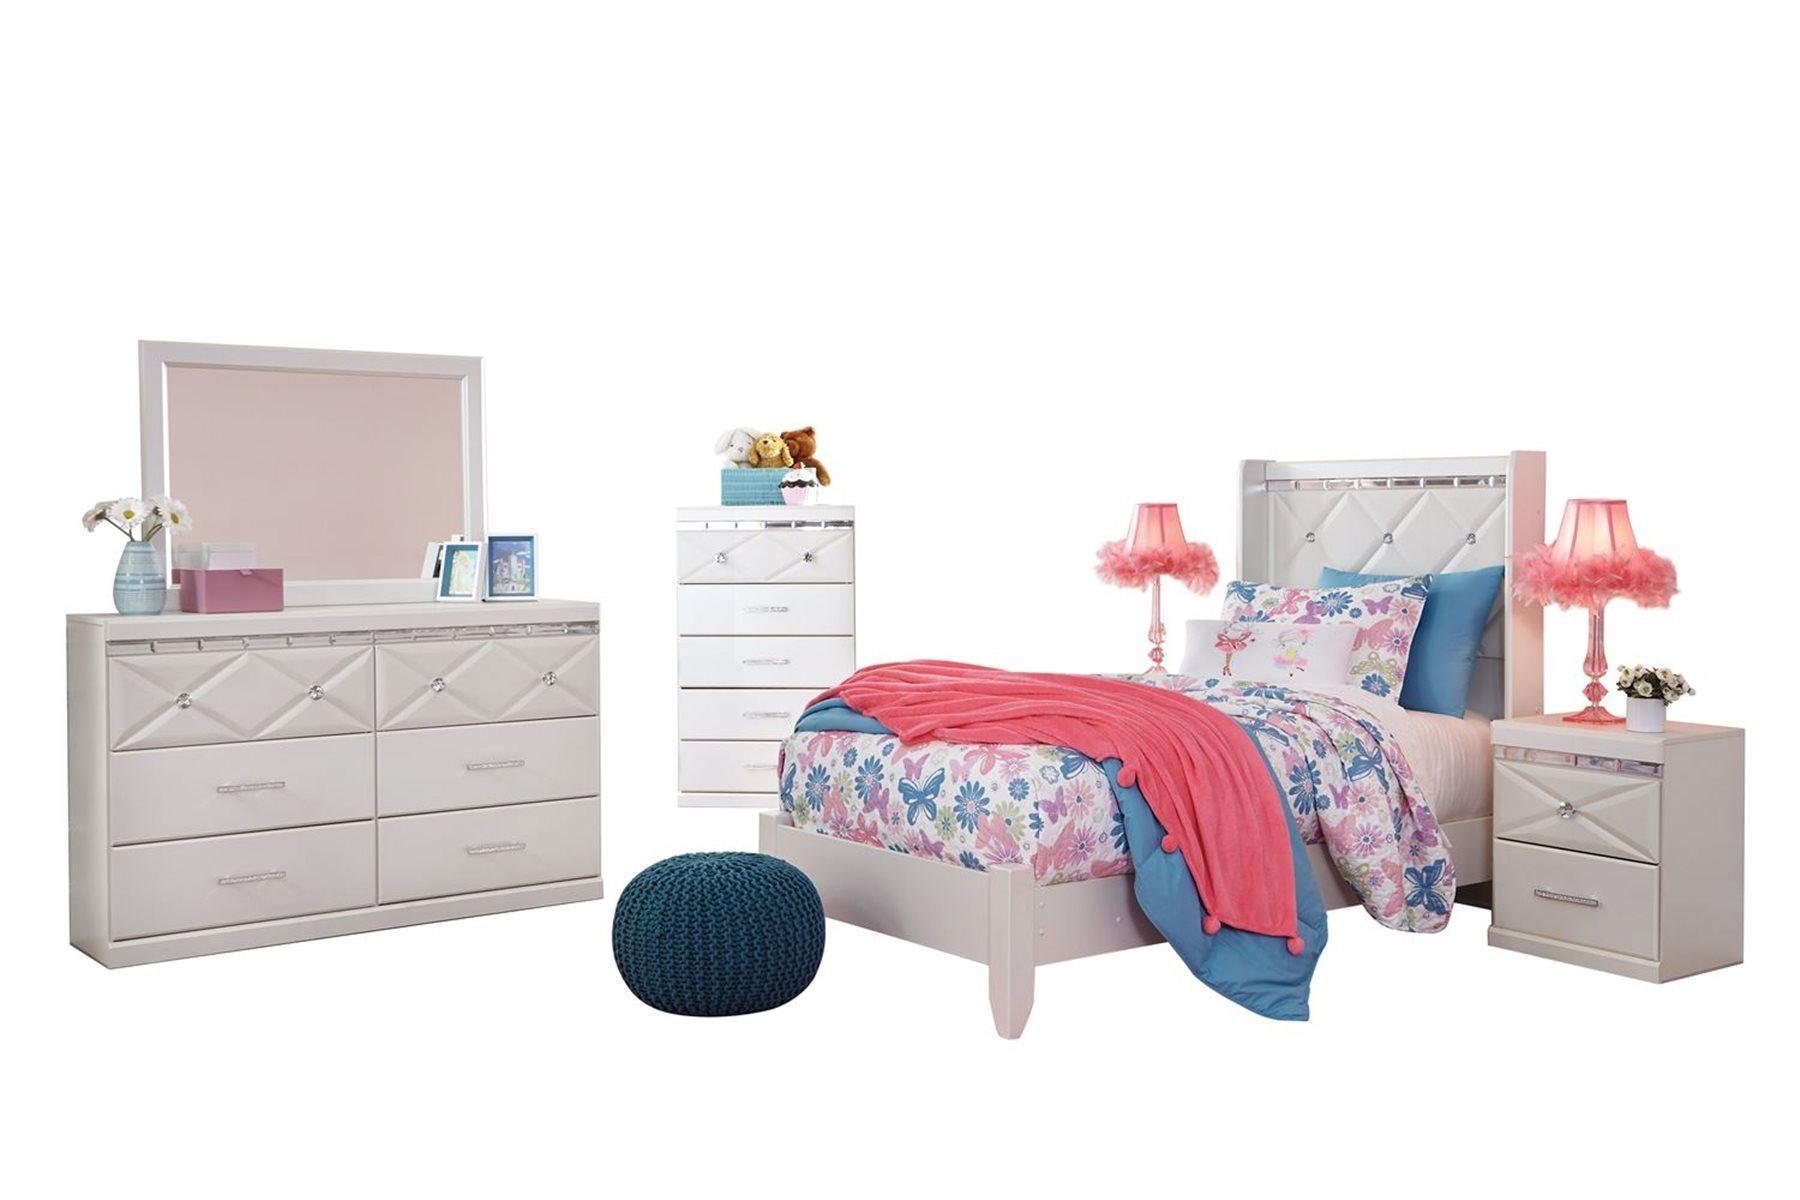 ashley furniture dreamur 6 pc bedroom set twin panel bed dresser mirror 2 nightstands chest champagne walmart com